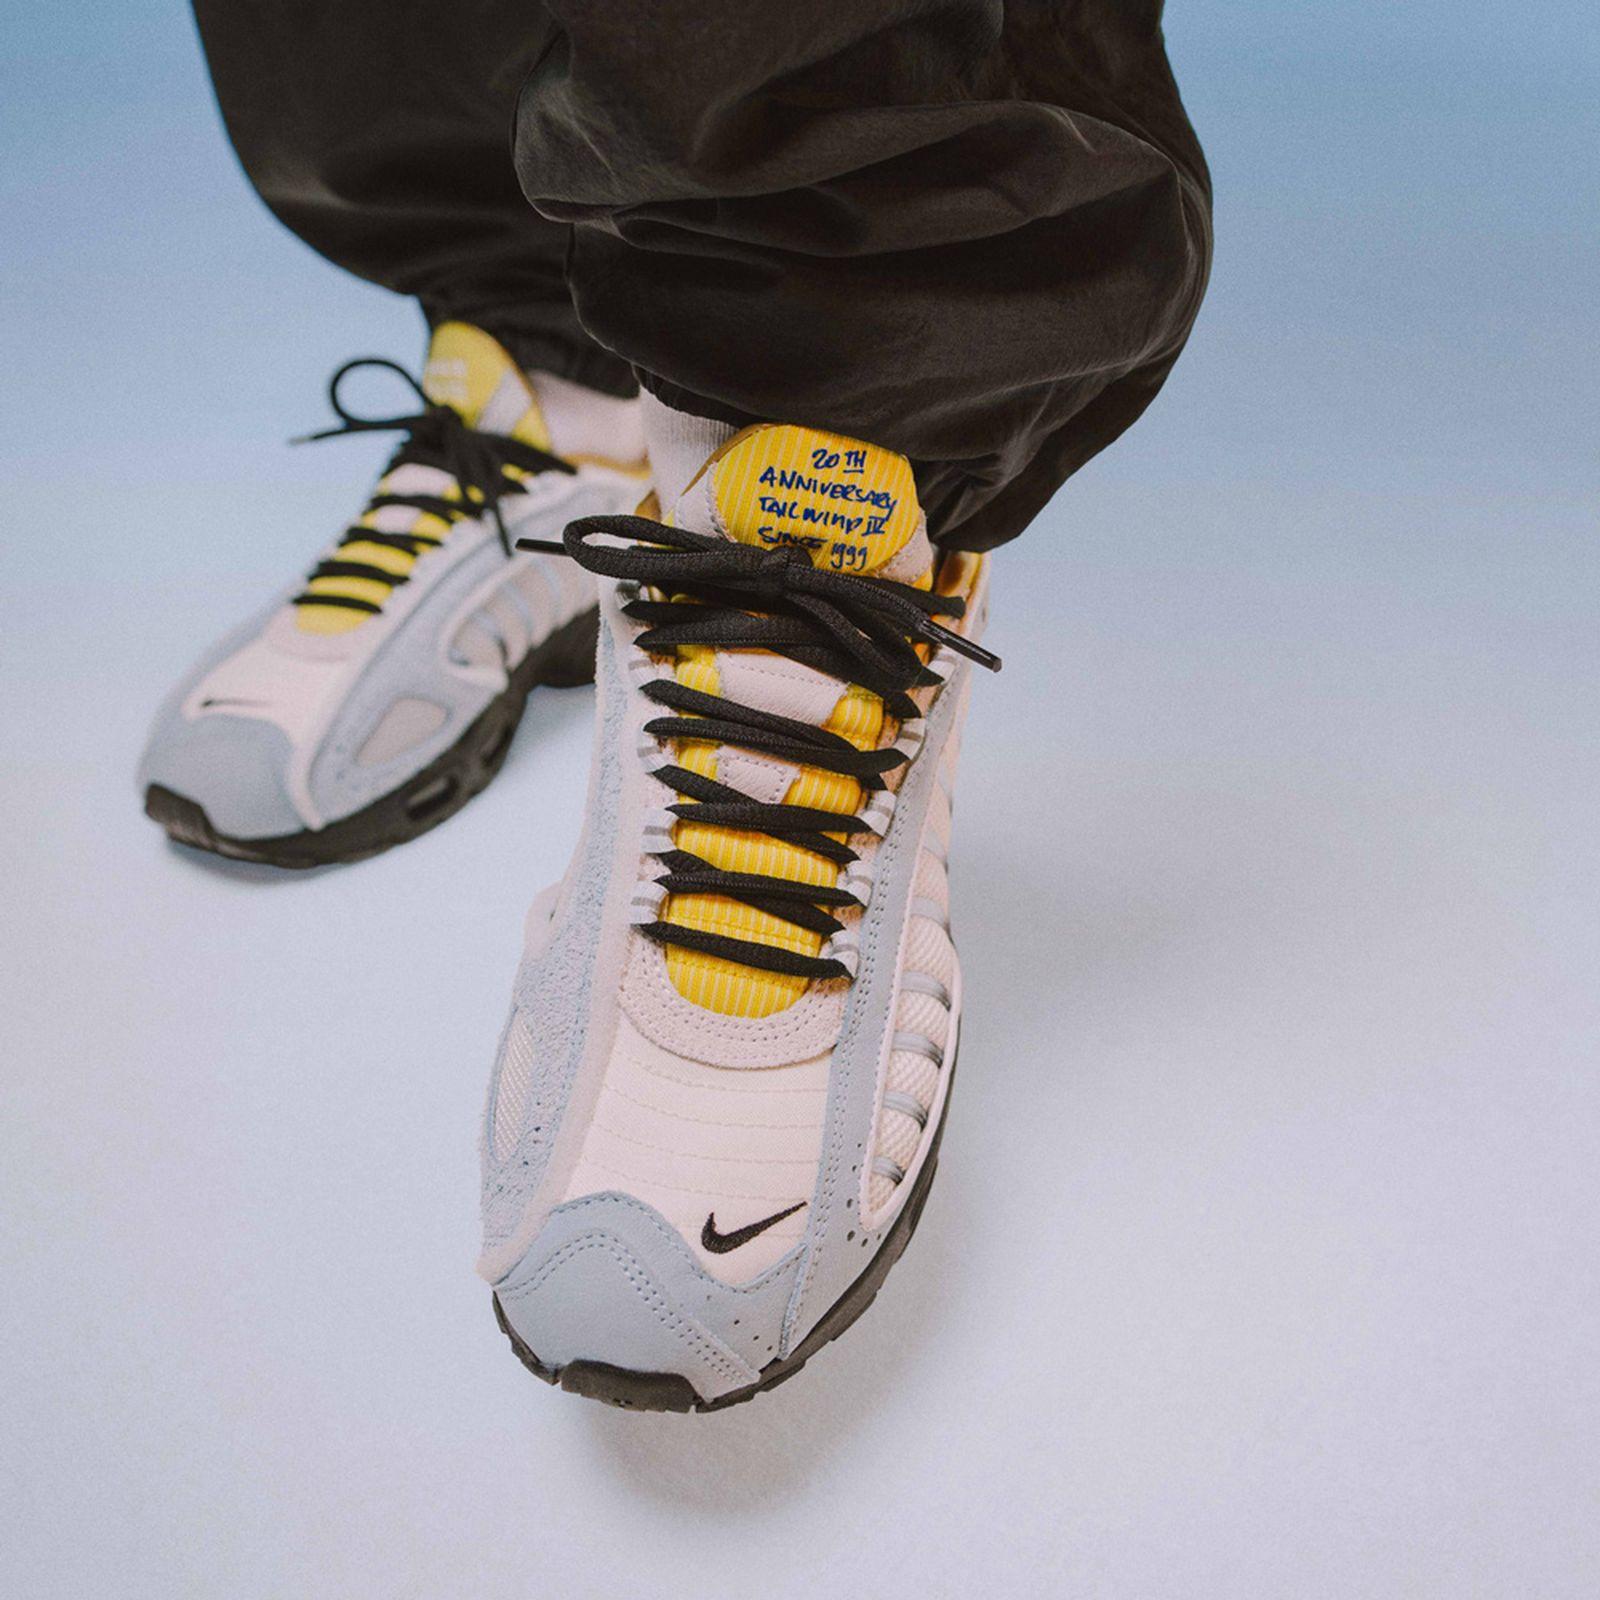 sneakersnstuff nike air max tailwind 4 release date price